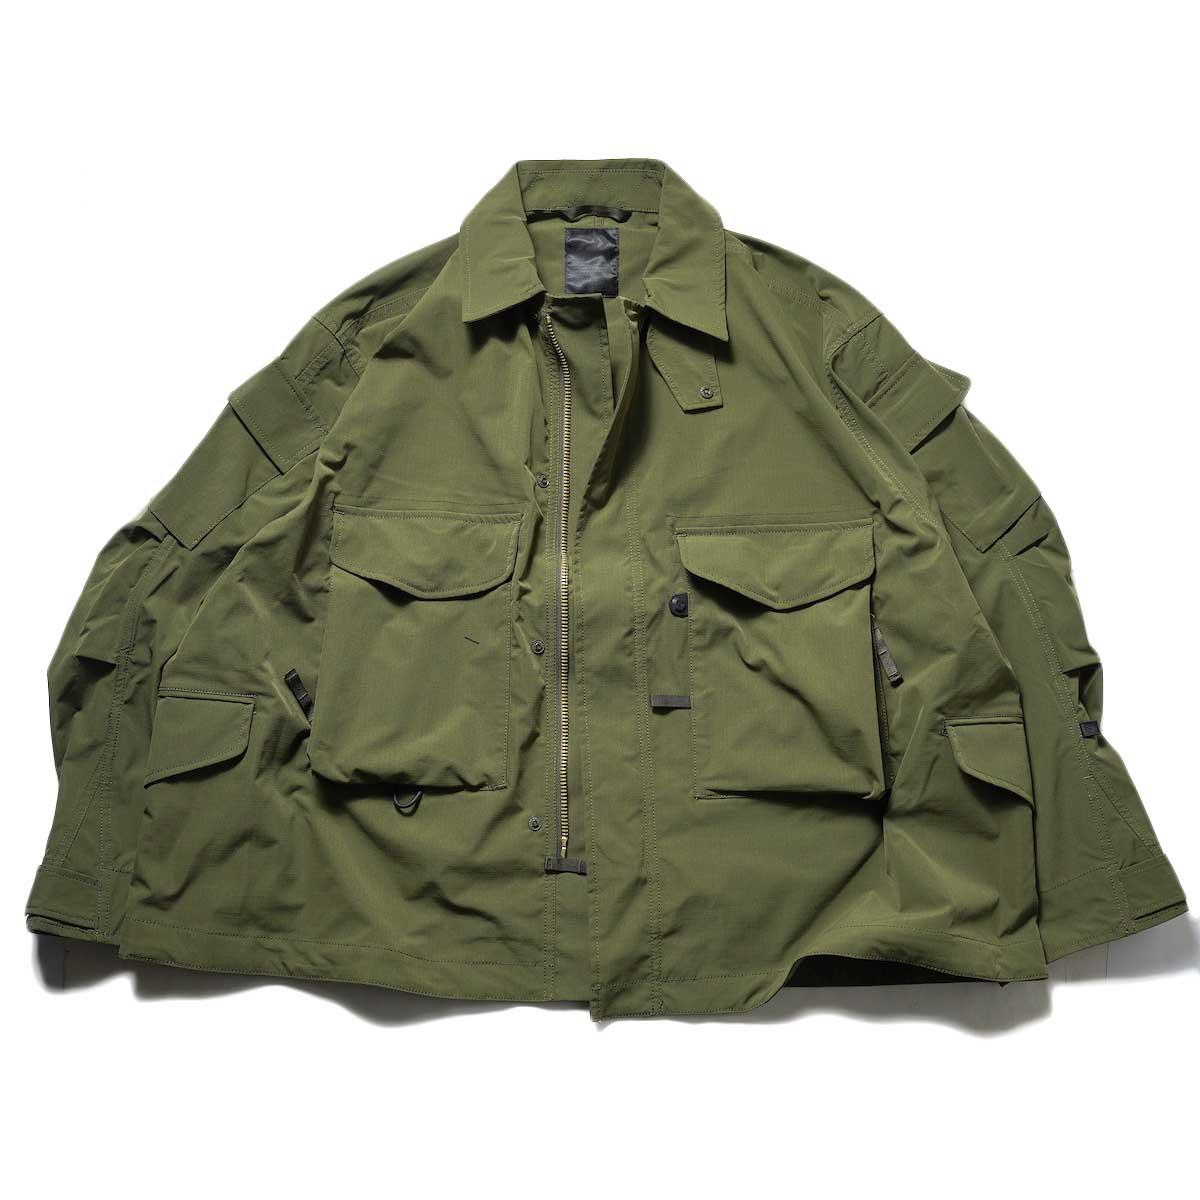 DAIWA PIER39 / Tech Mil BDU Jacket (Rip-Stop) (Olive)